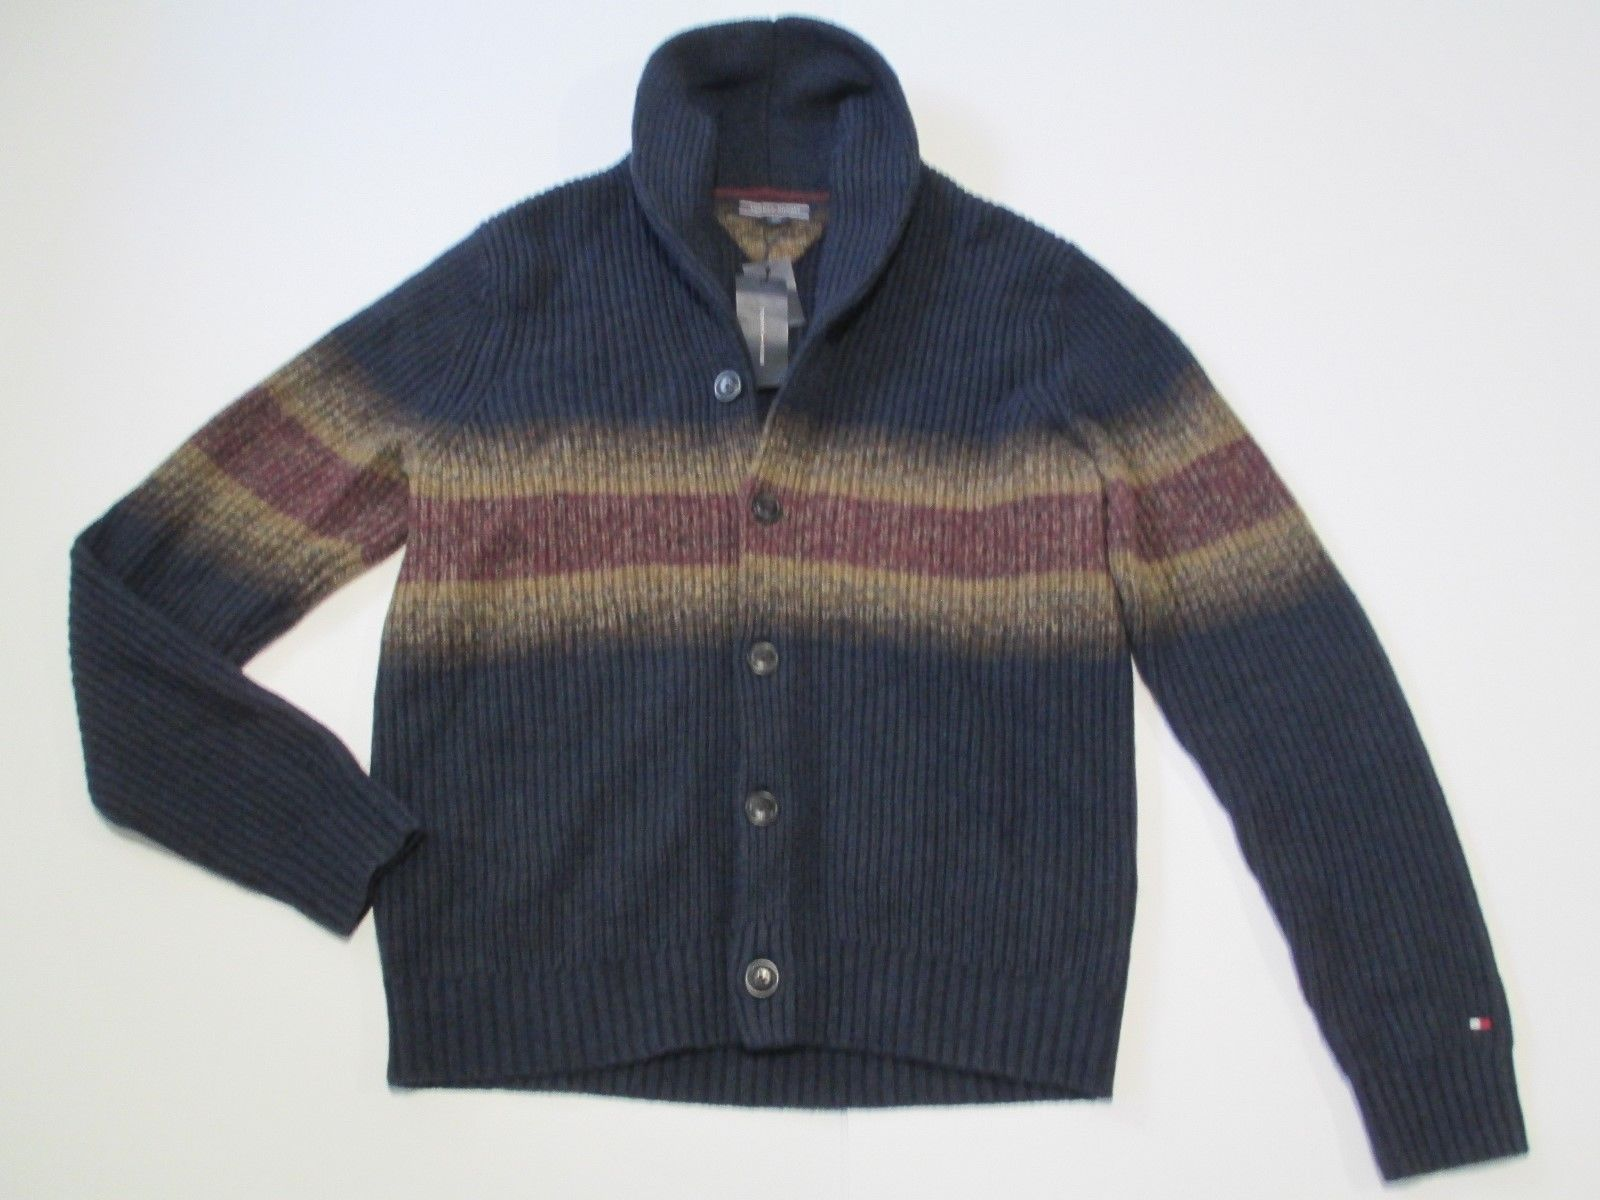 Tommy Hilfiger Shawl Collar Cardigan, Multi-Color, Sz. Large